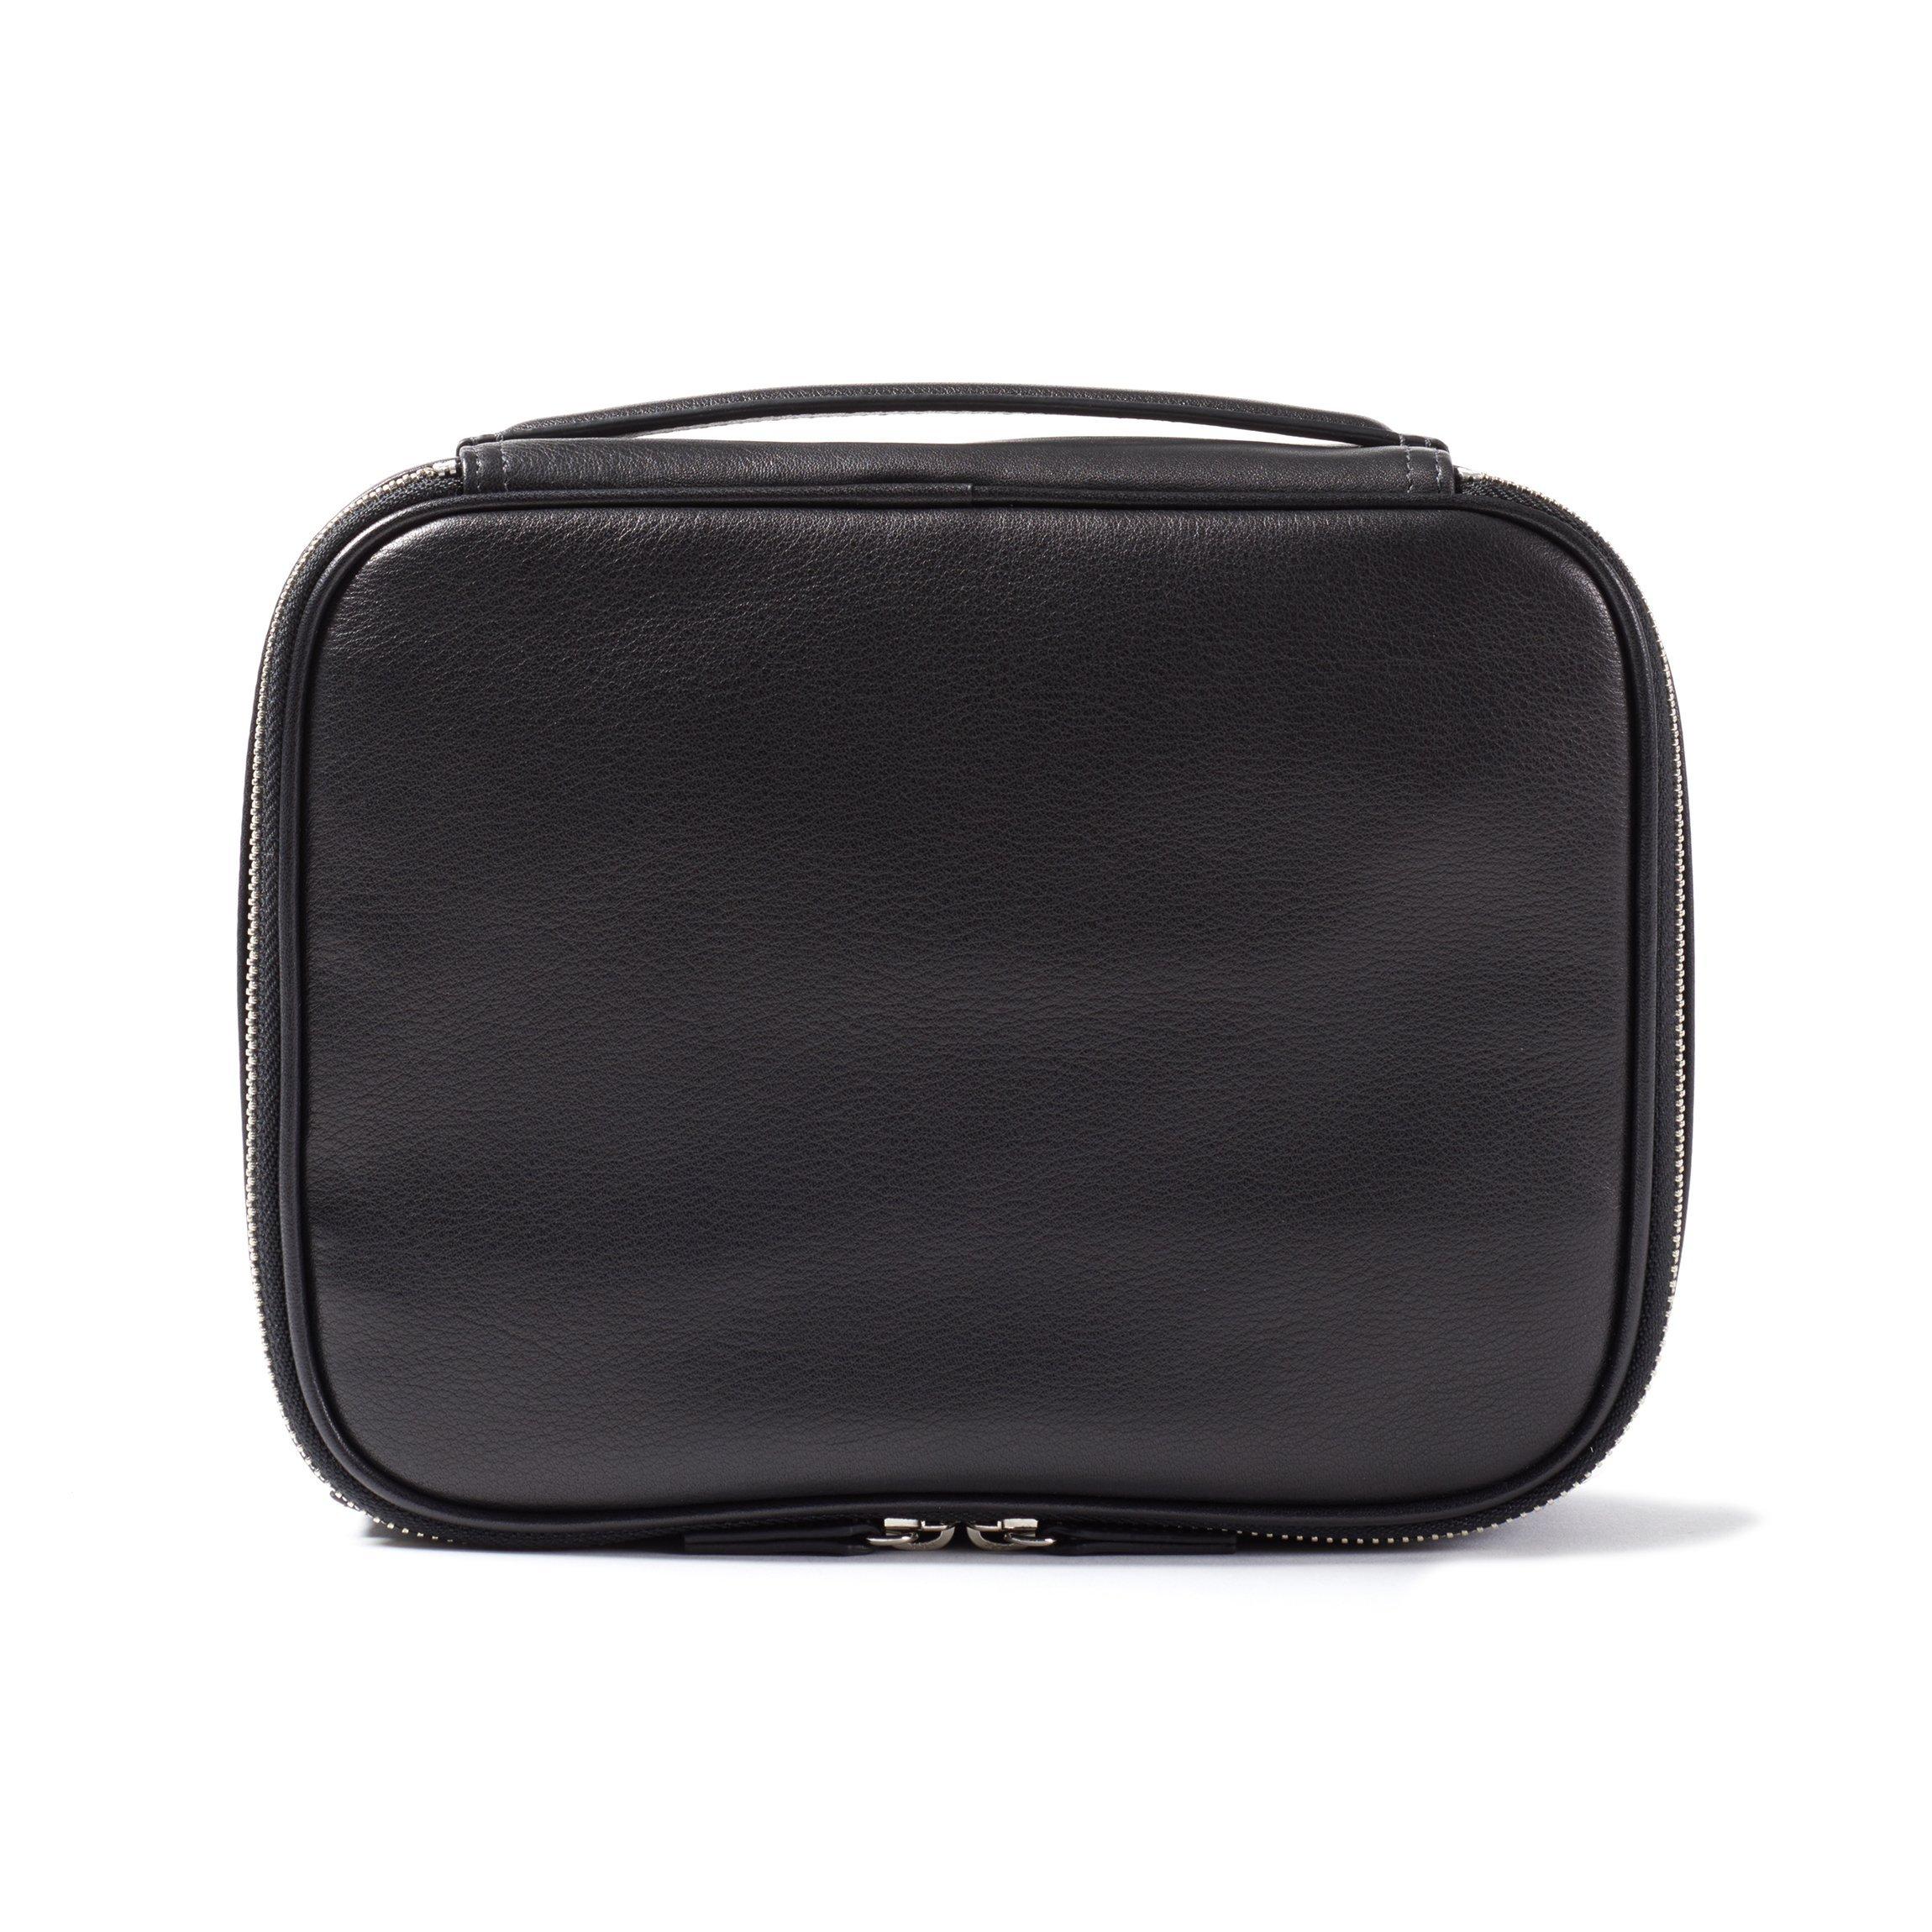 Leatherology Large Tech Bag Organizer - Full Grain Leather Leather - Black Onyx (black)